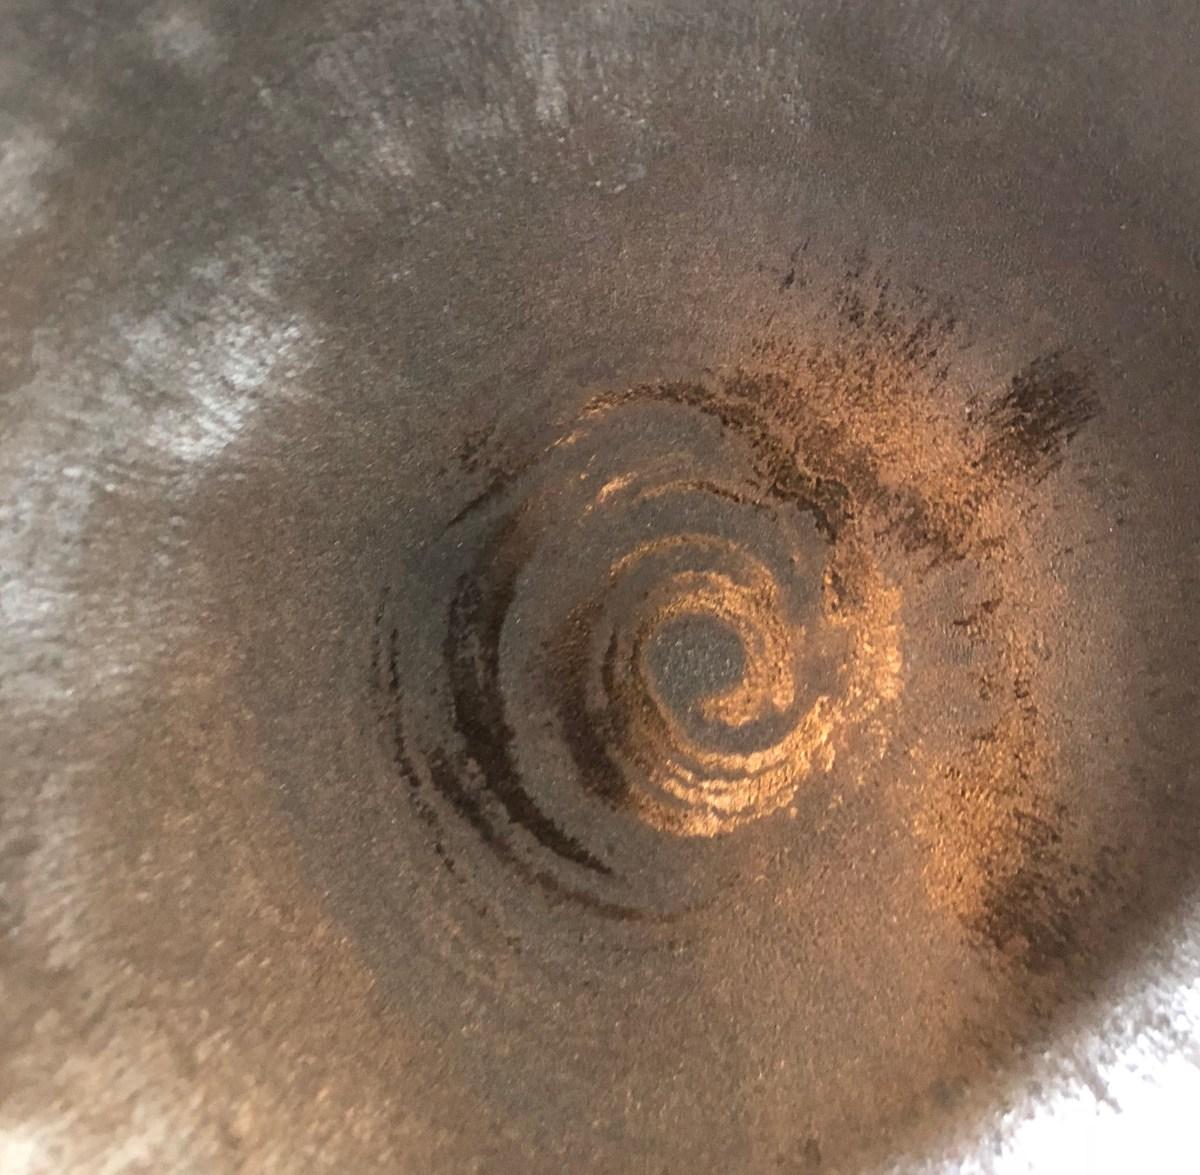 tabletop-kyoto ware-metallic glaze detail-artefacthome